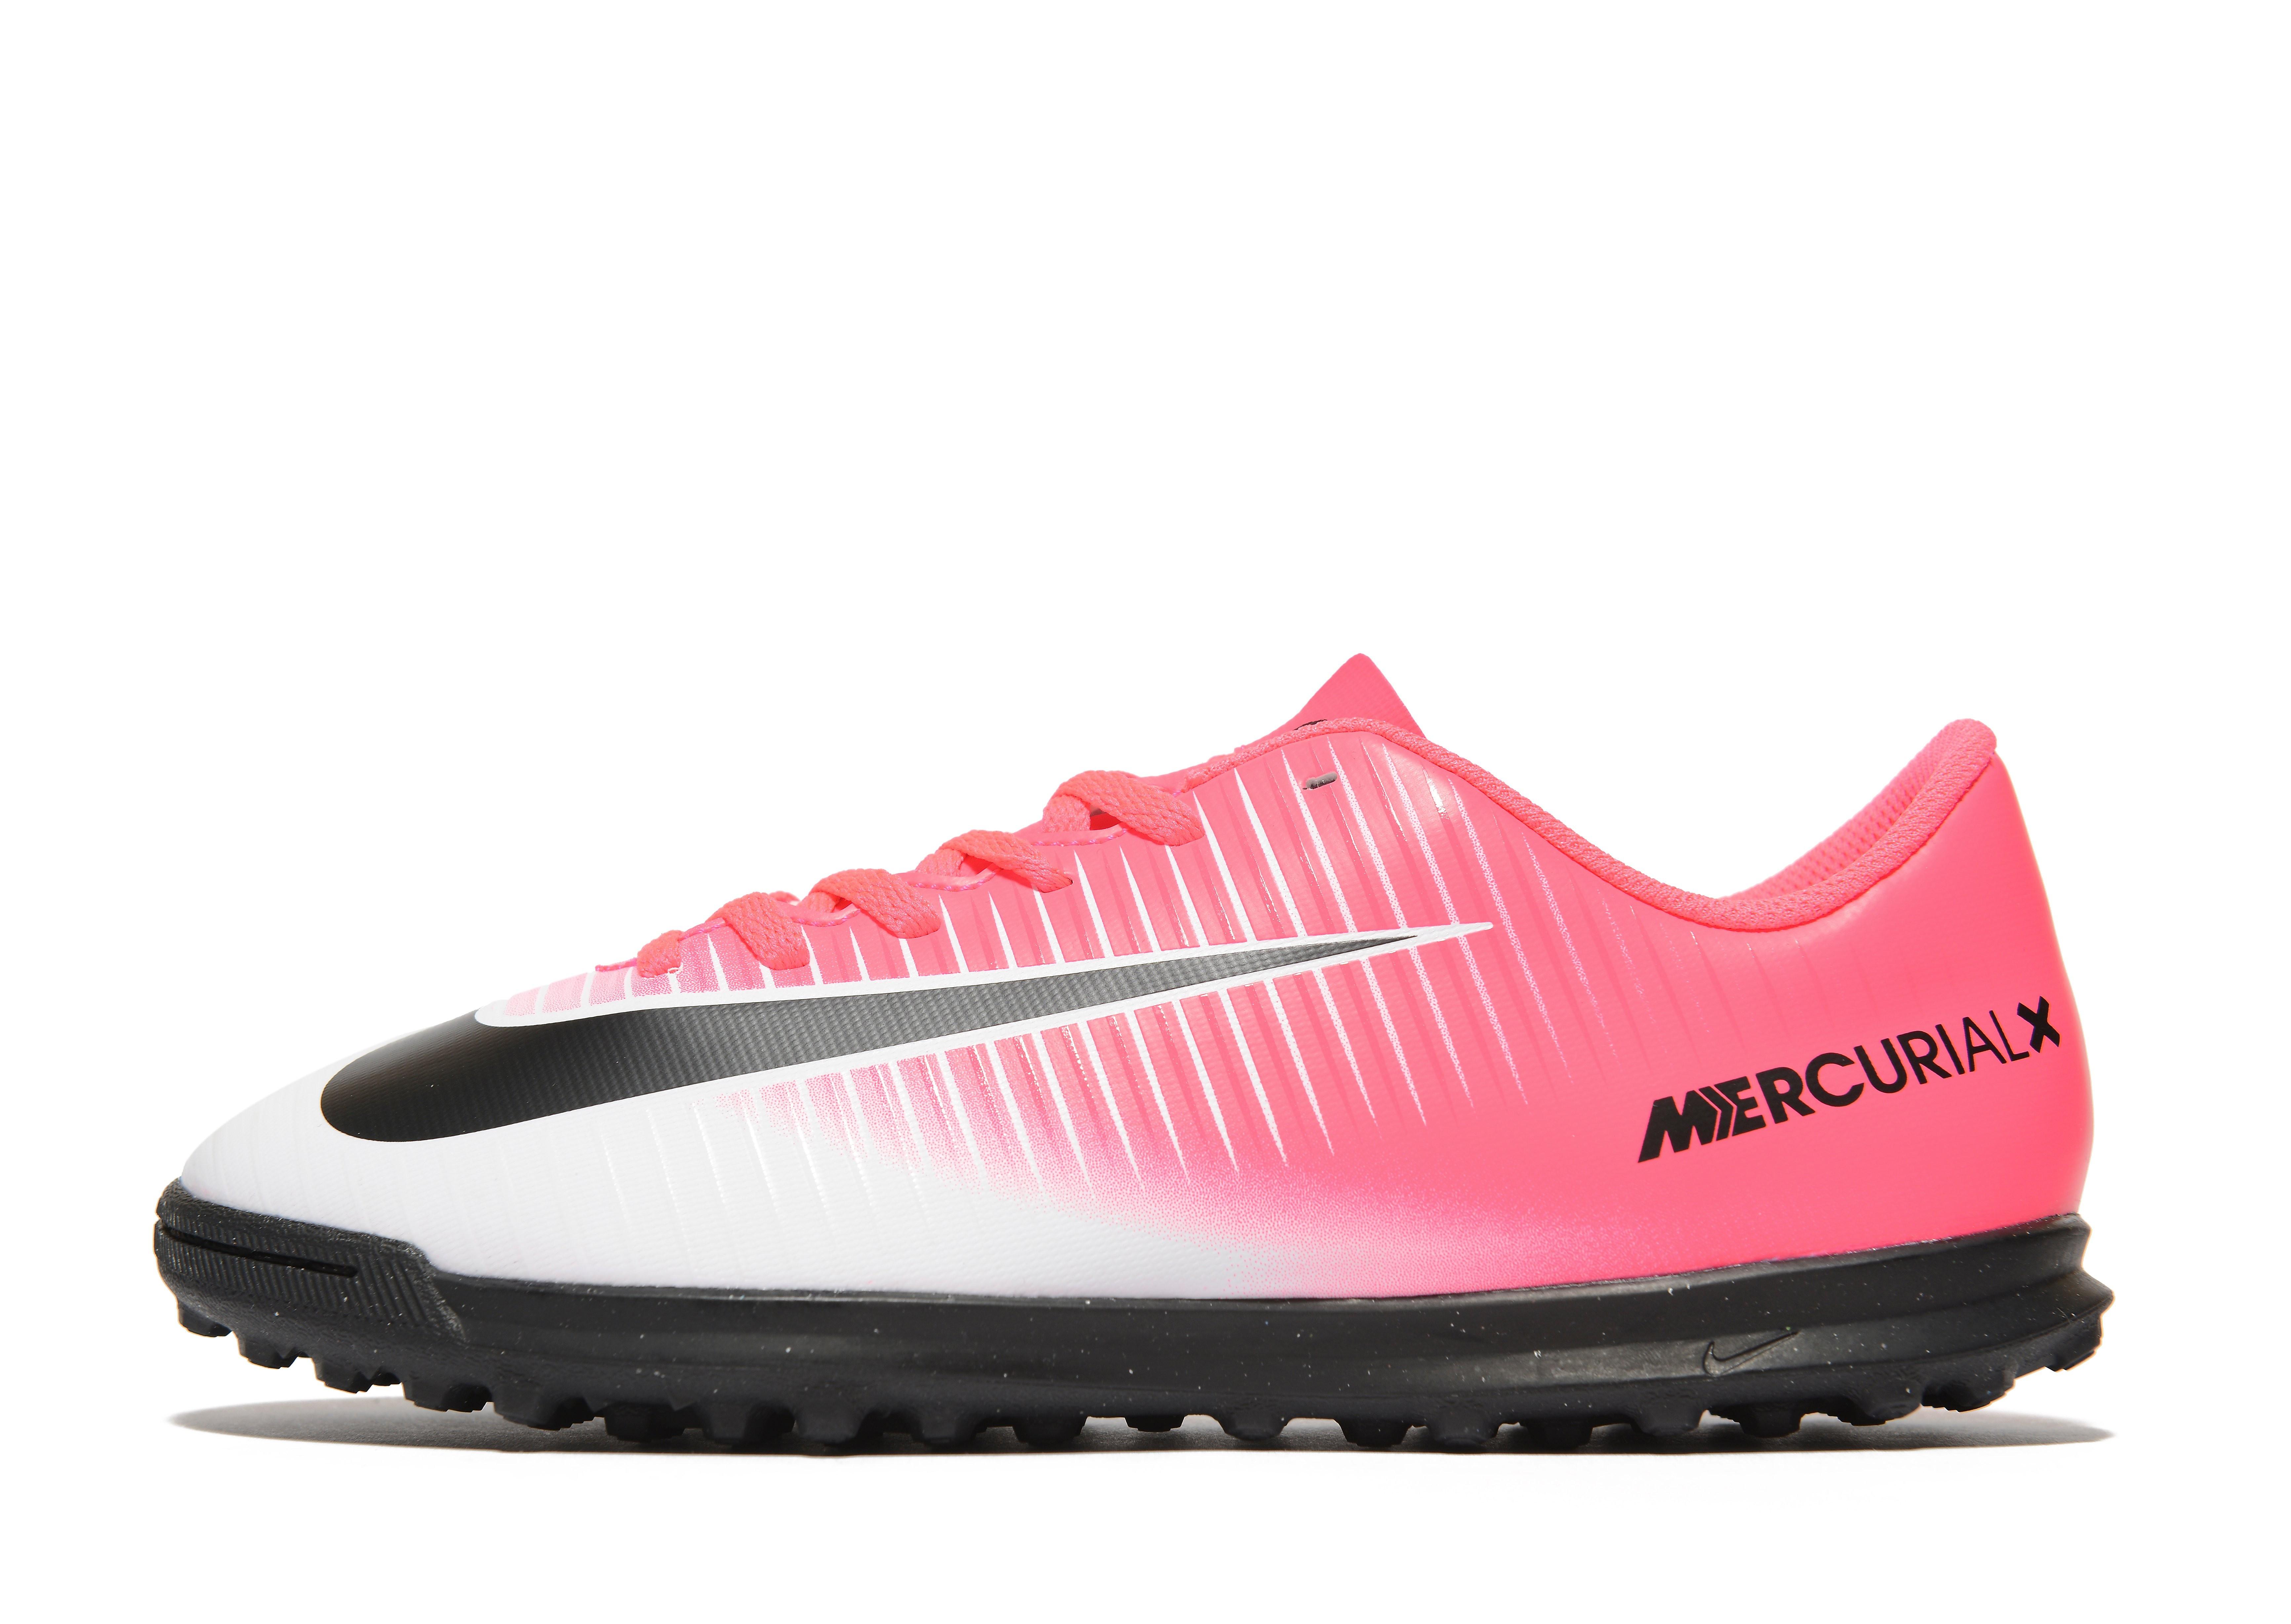 Nike Motion Blur Mercurial Vortex Junior TF Football Boots